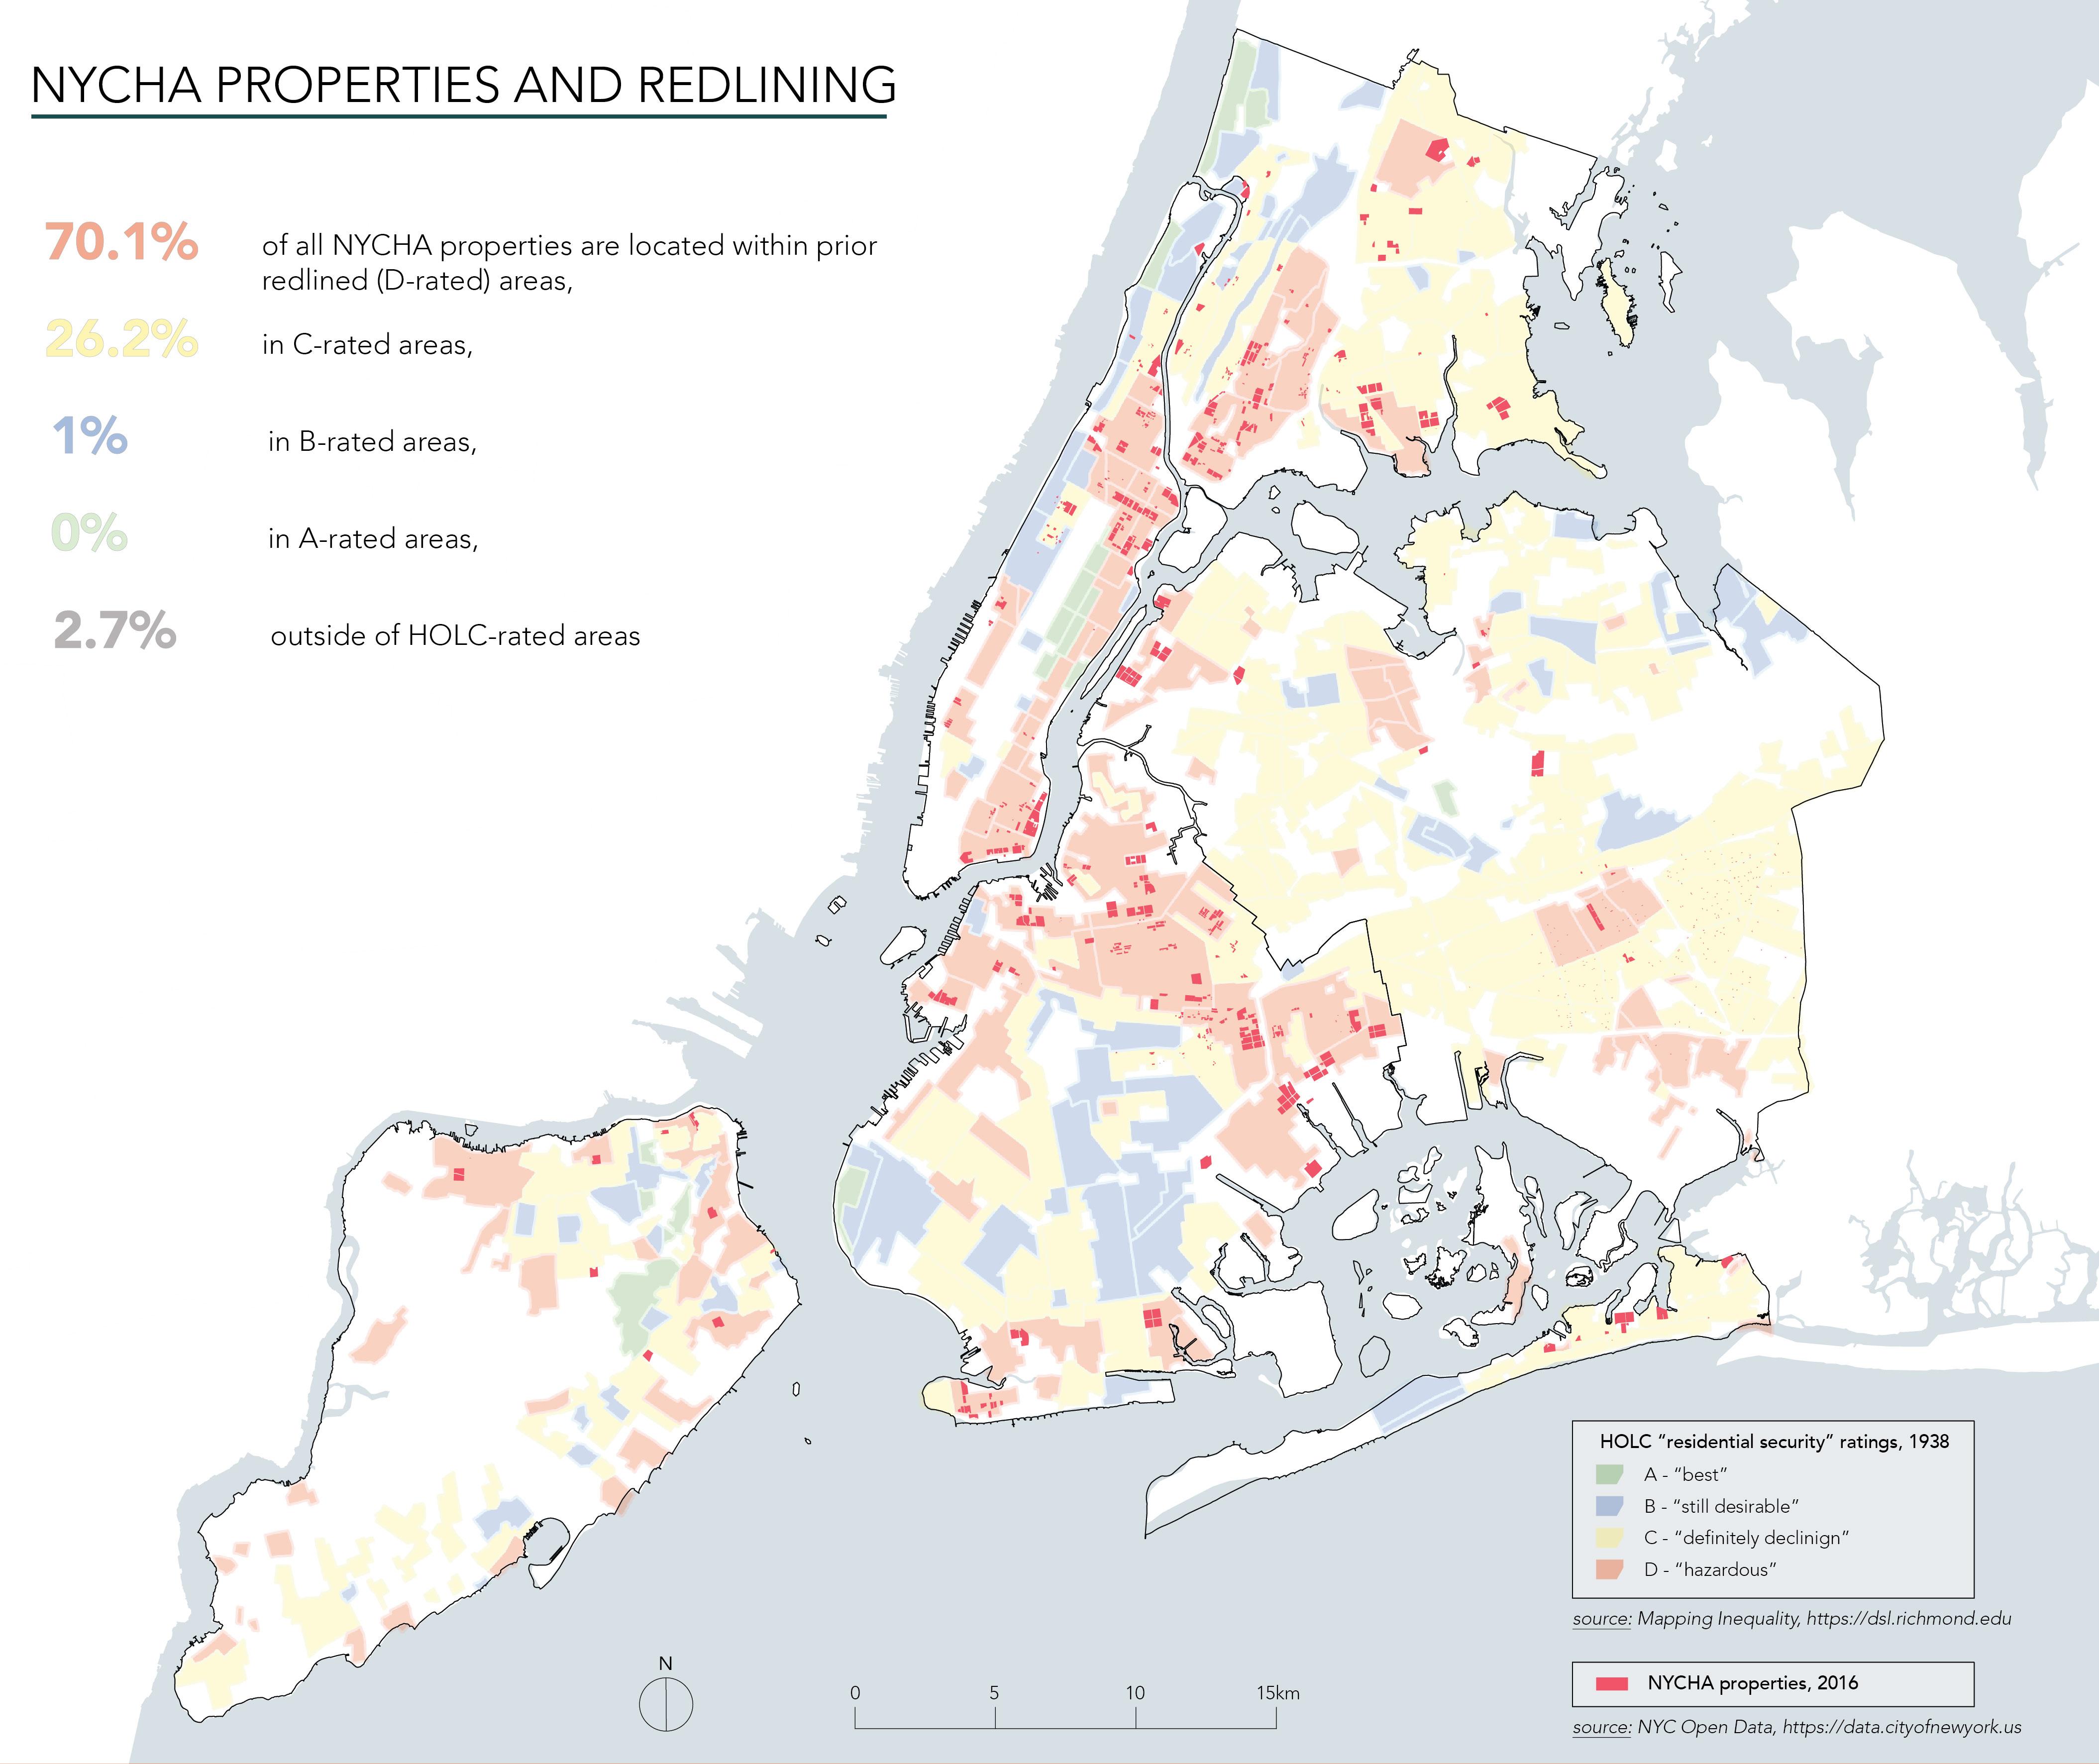 Redlining and NYCHA Properties